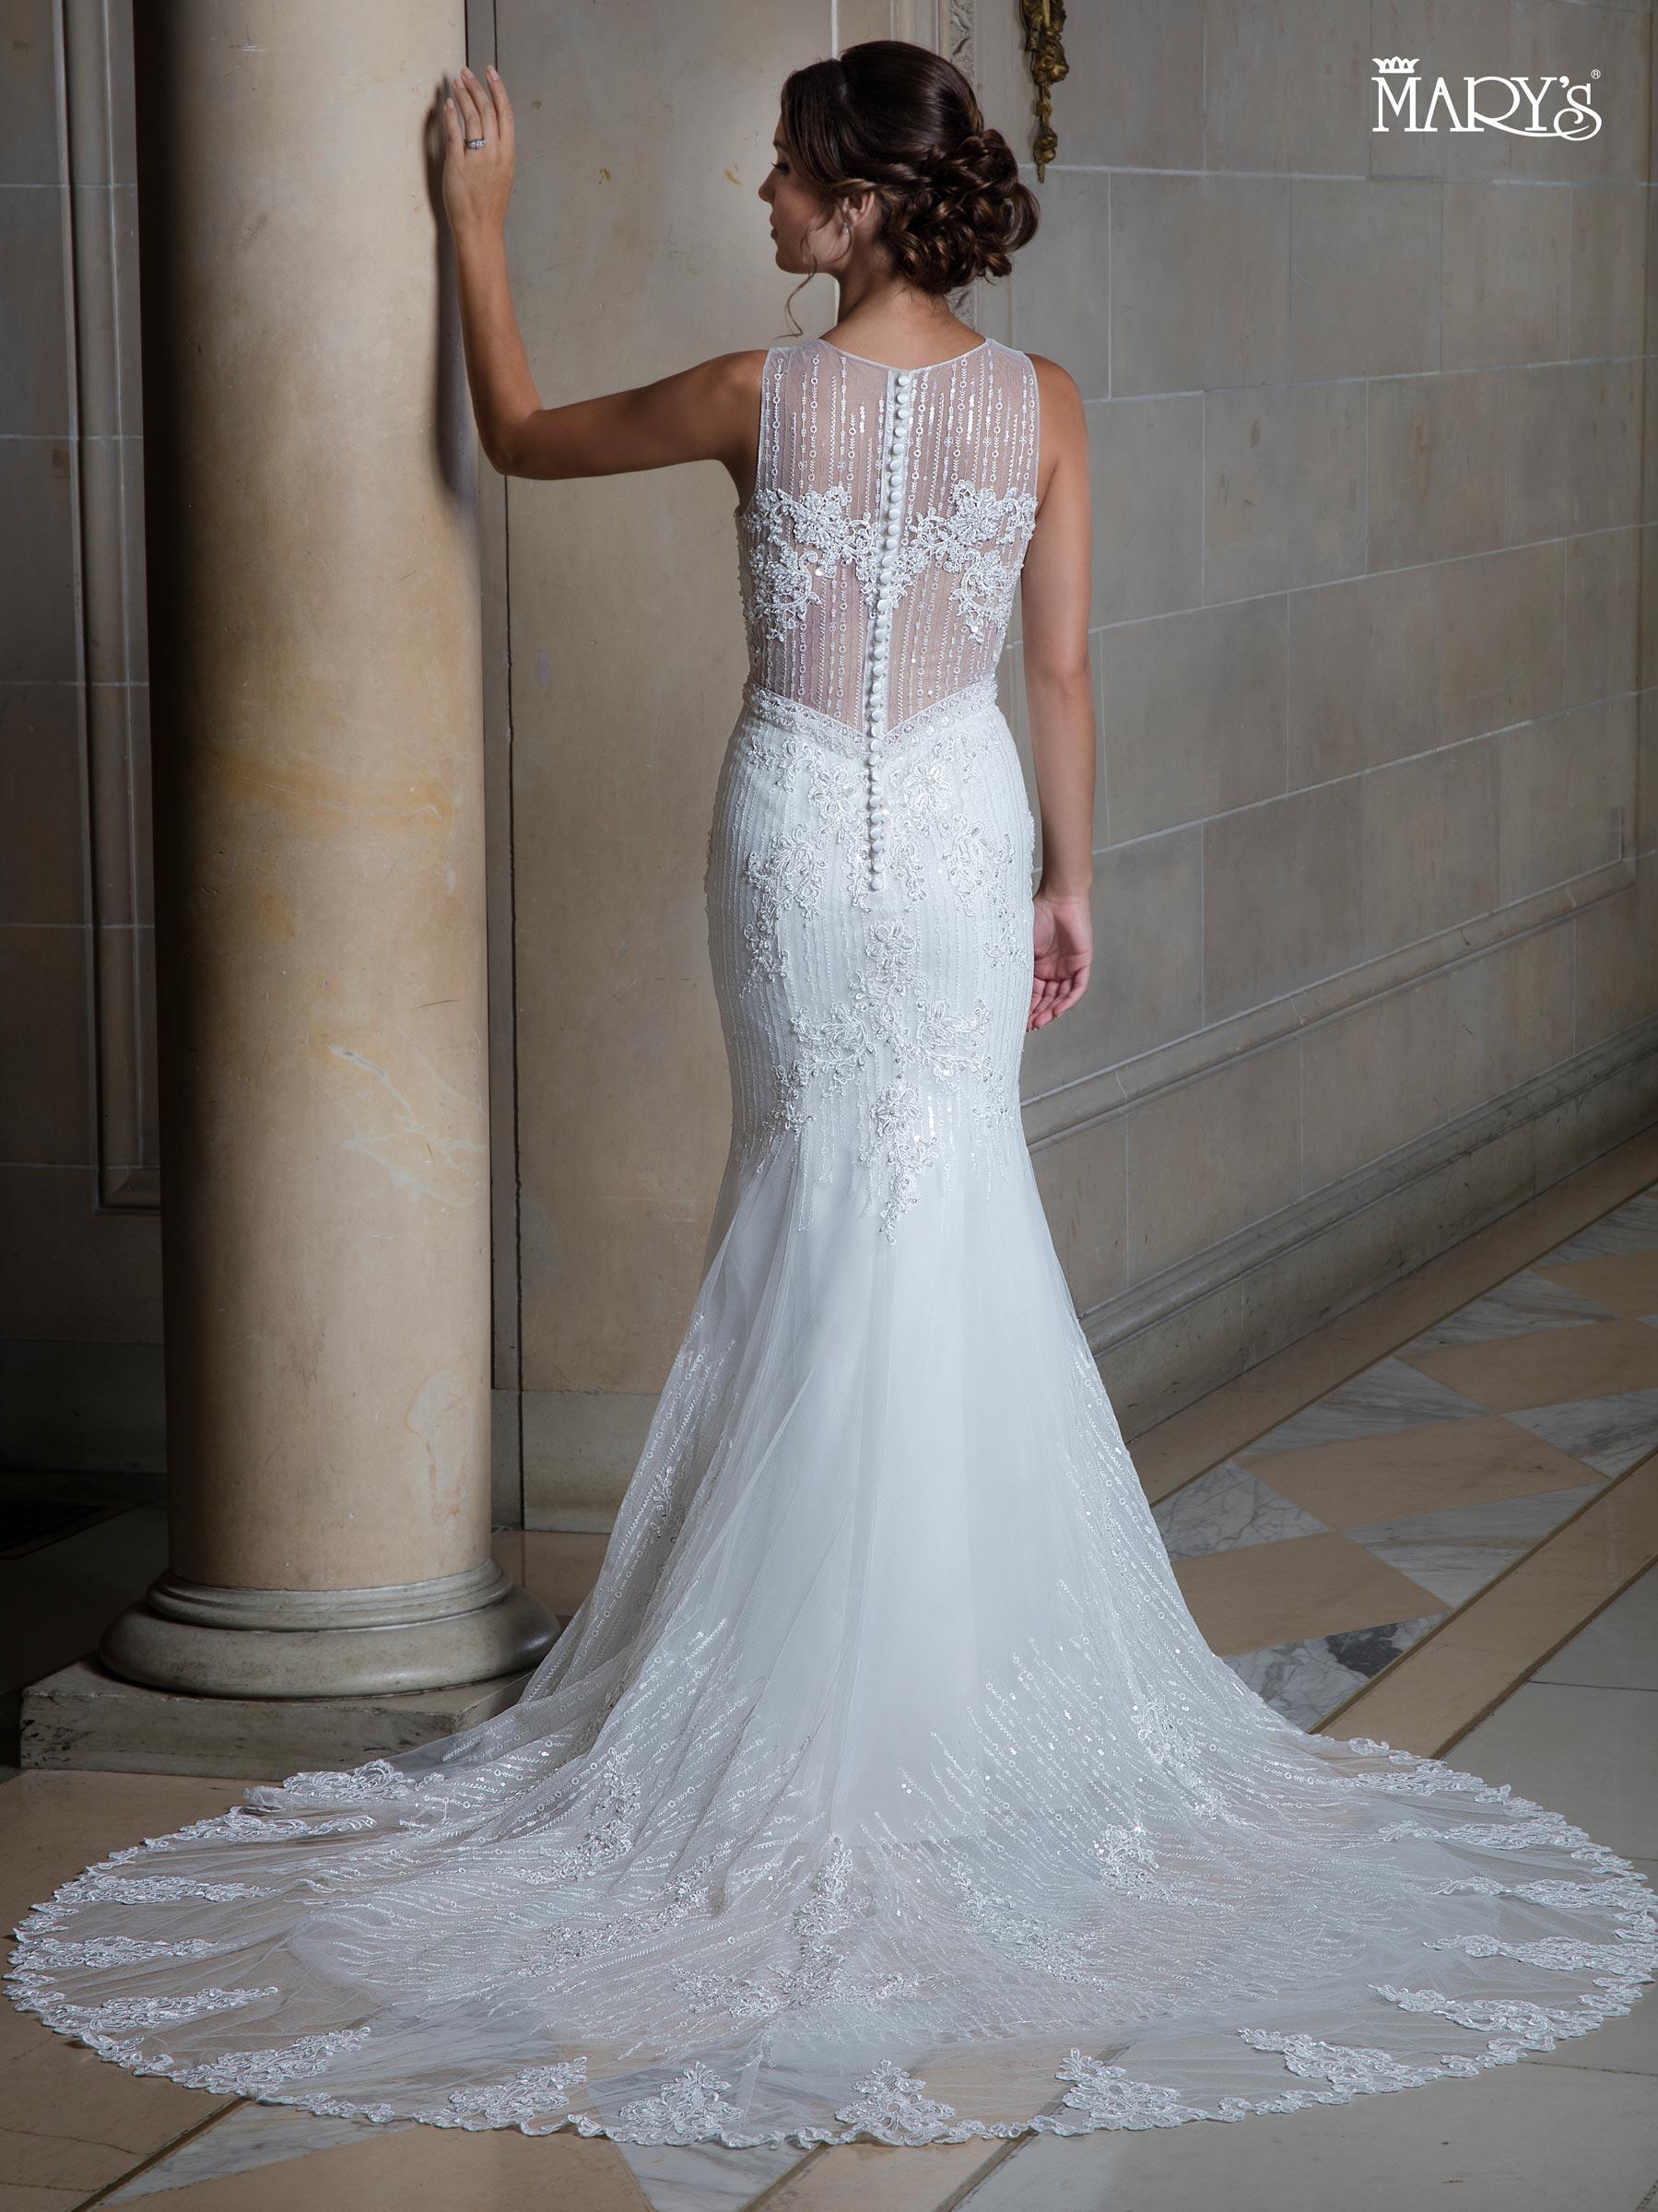 Colorful Louis Vuitton Wedding Dress Festooning - All Wedding ...